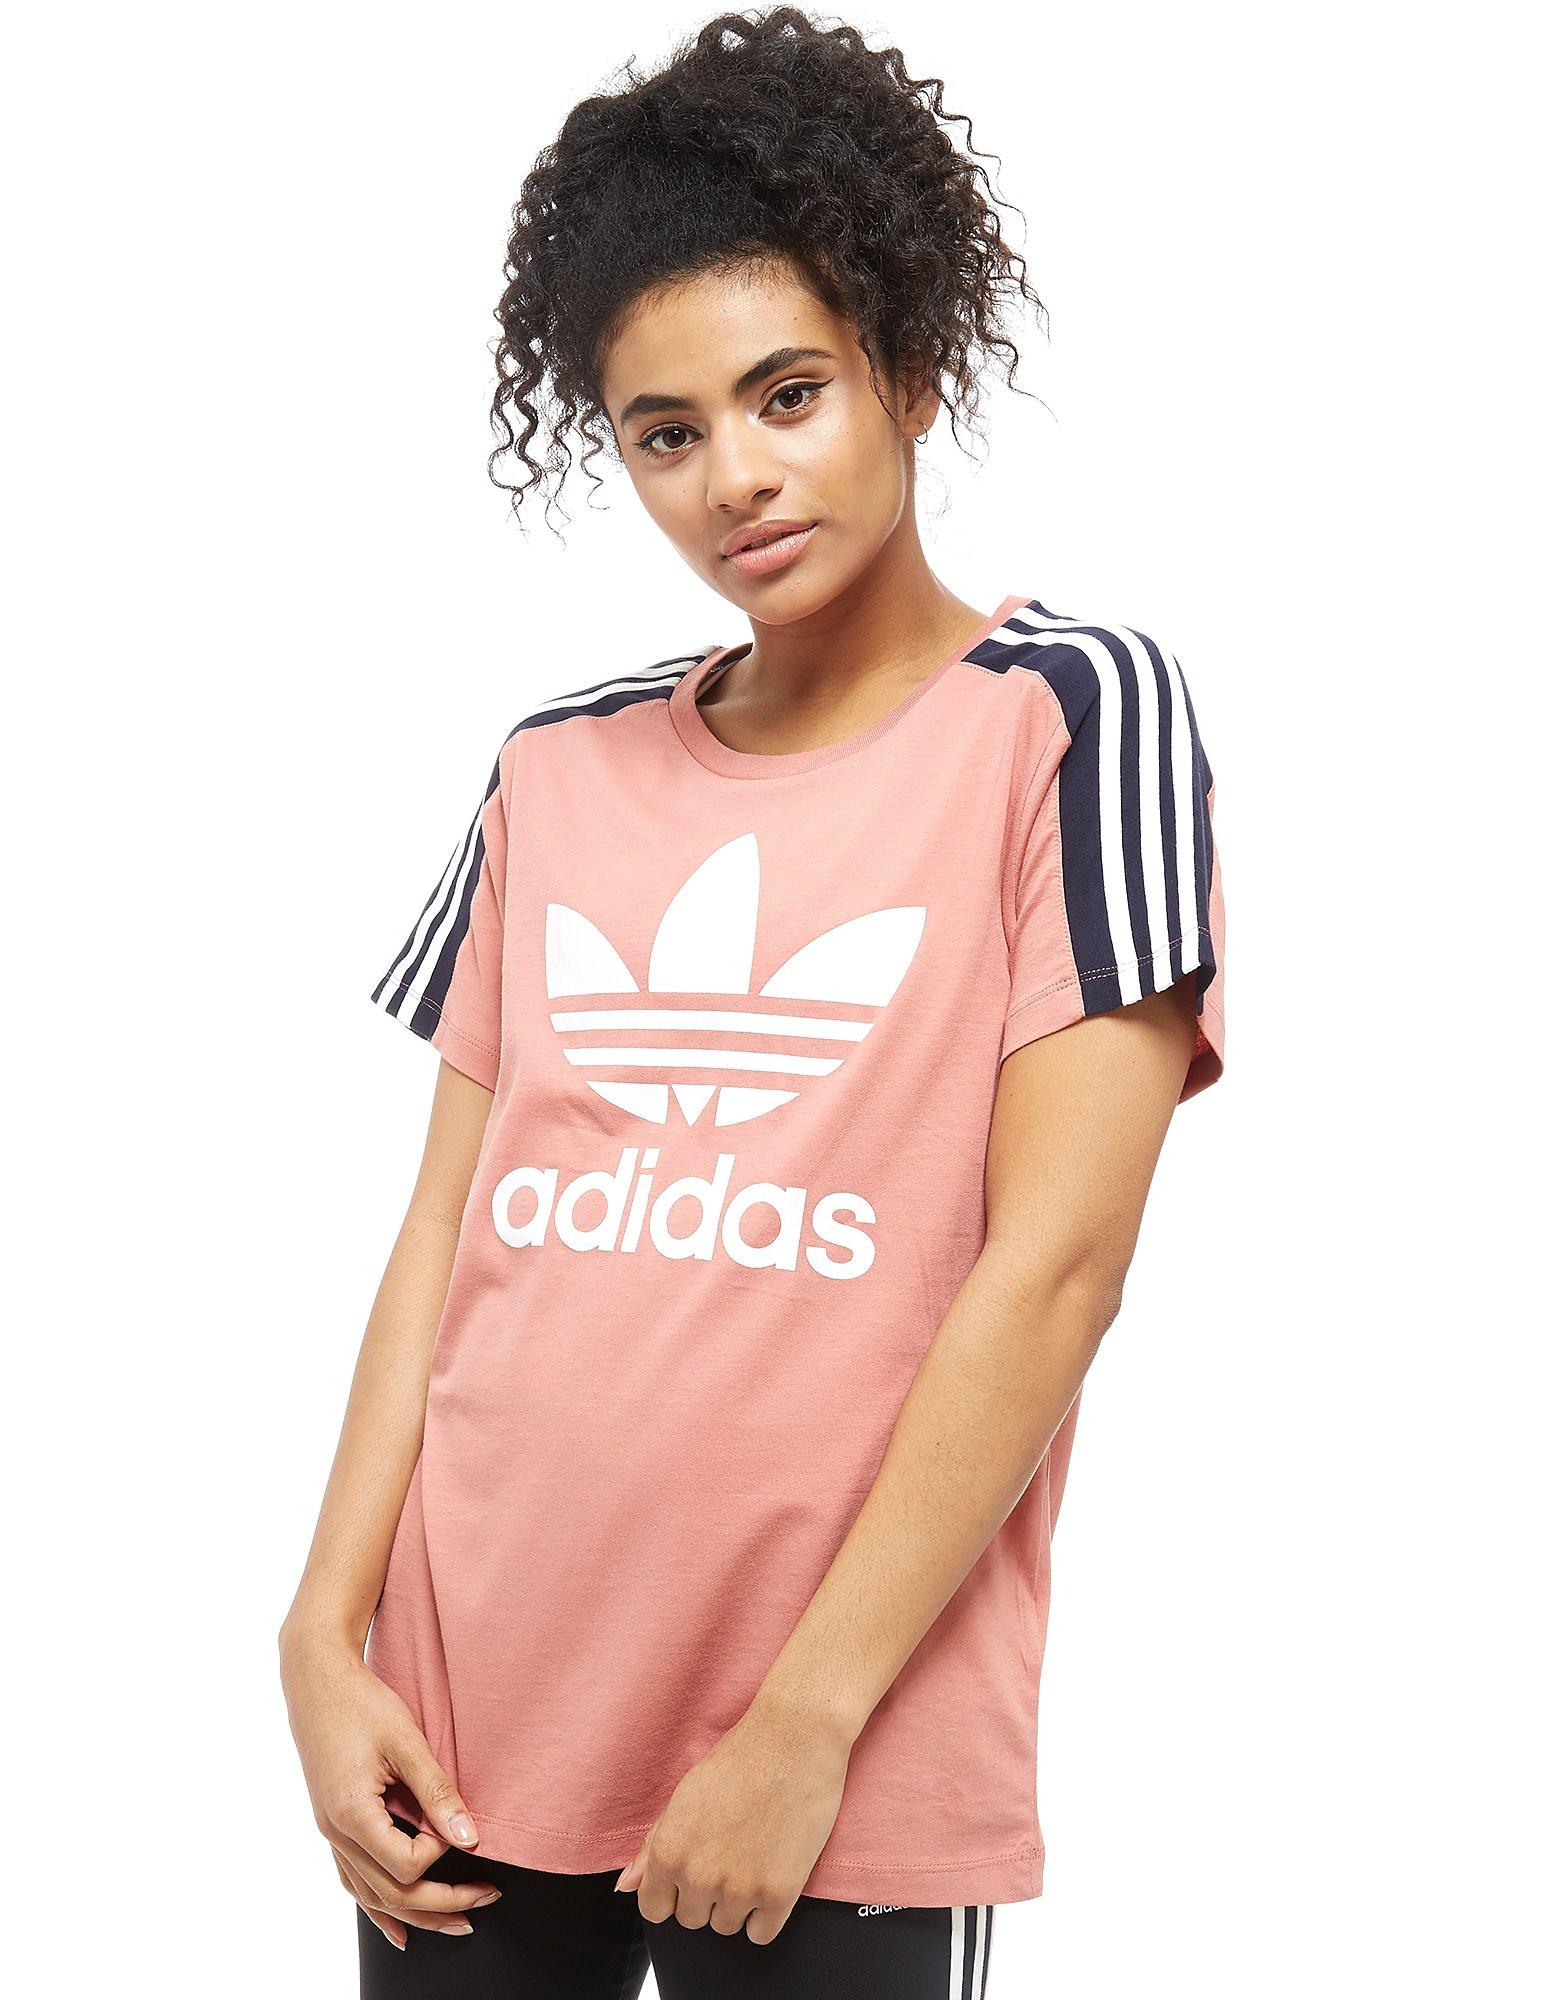 adidas Originals 3-Stripes Panel T-Shirt